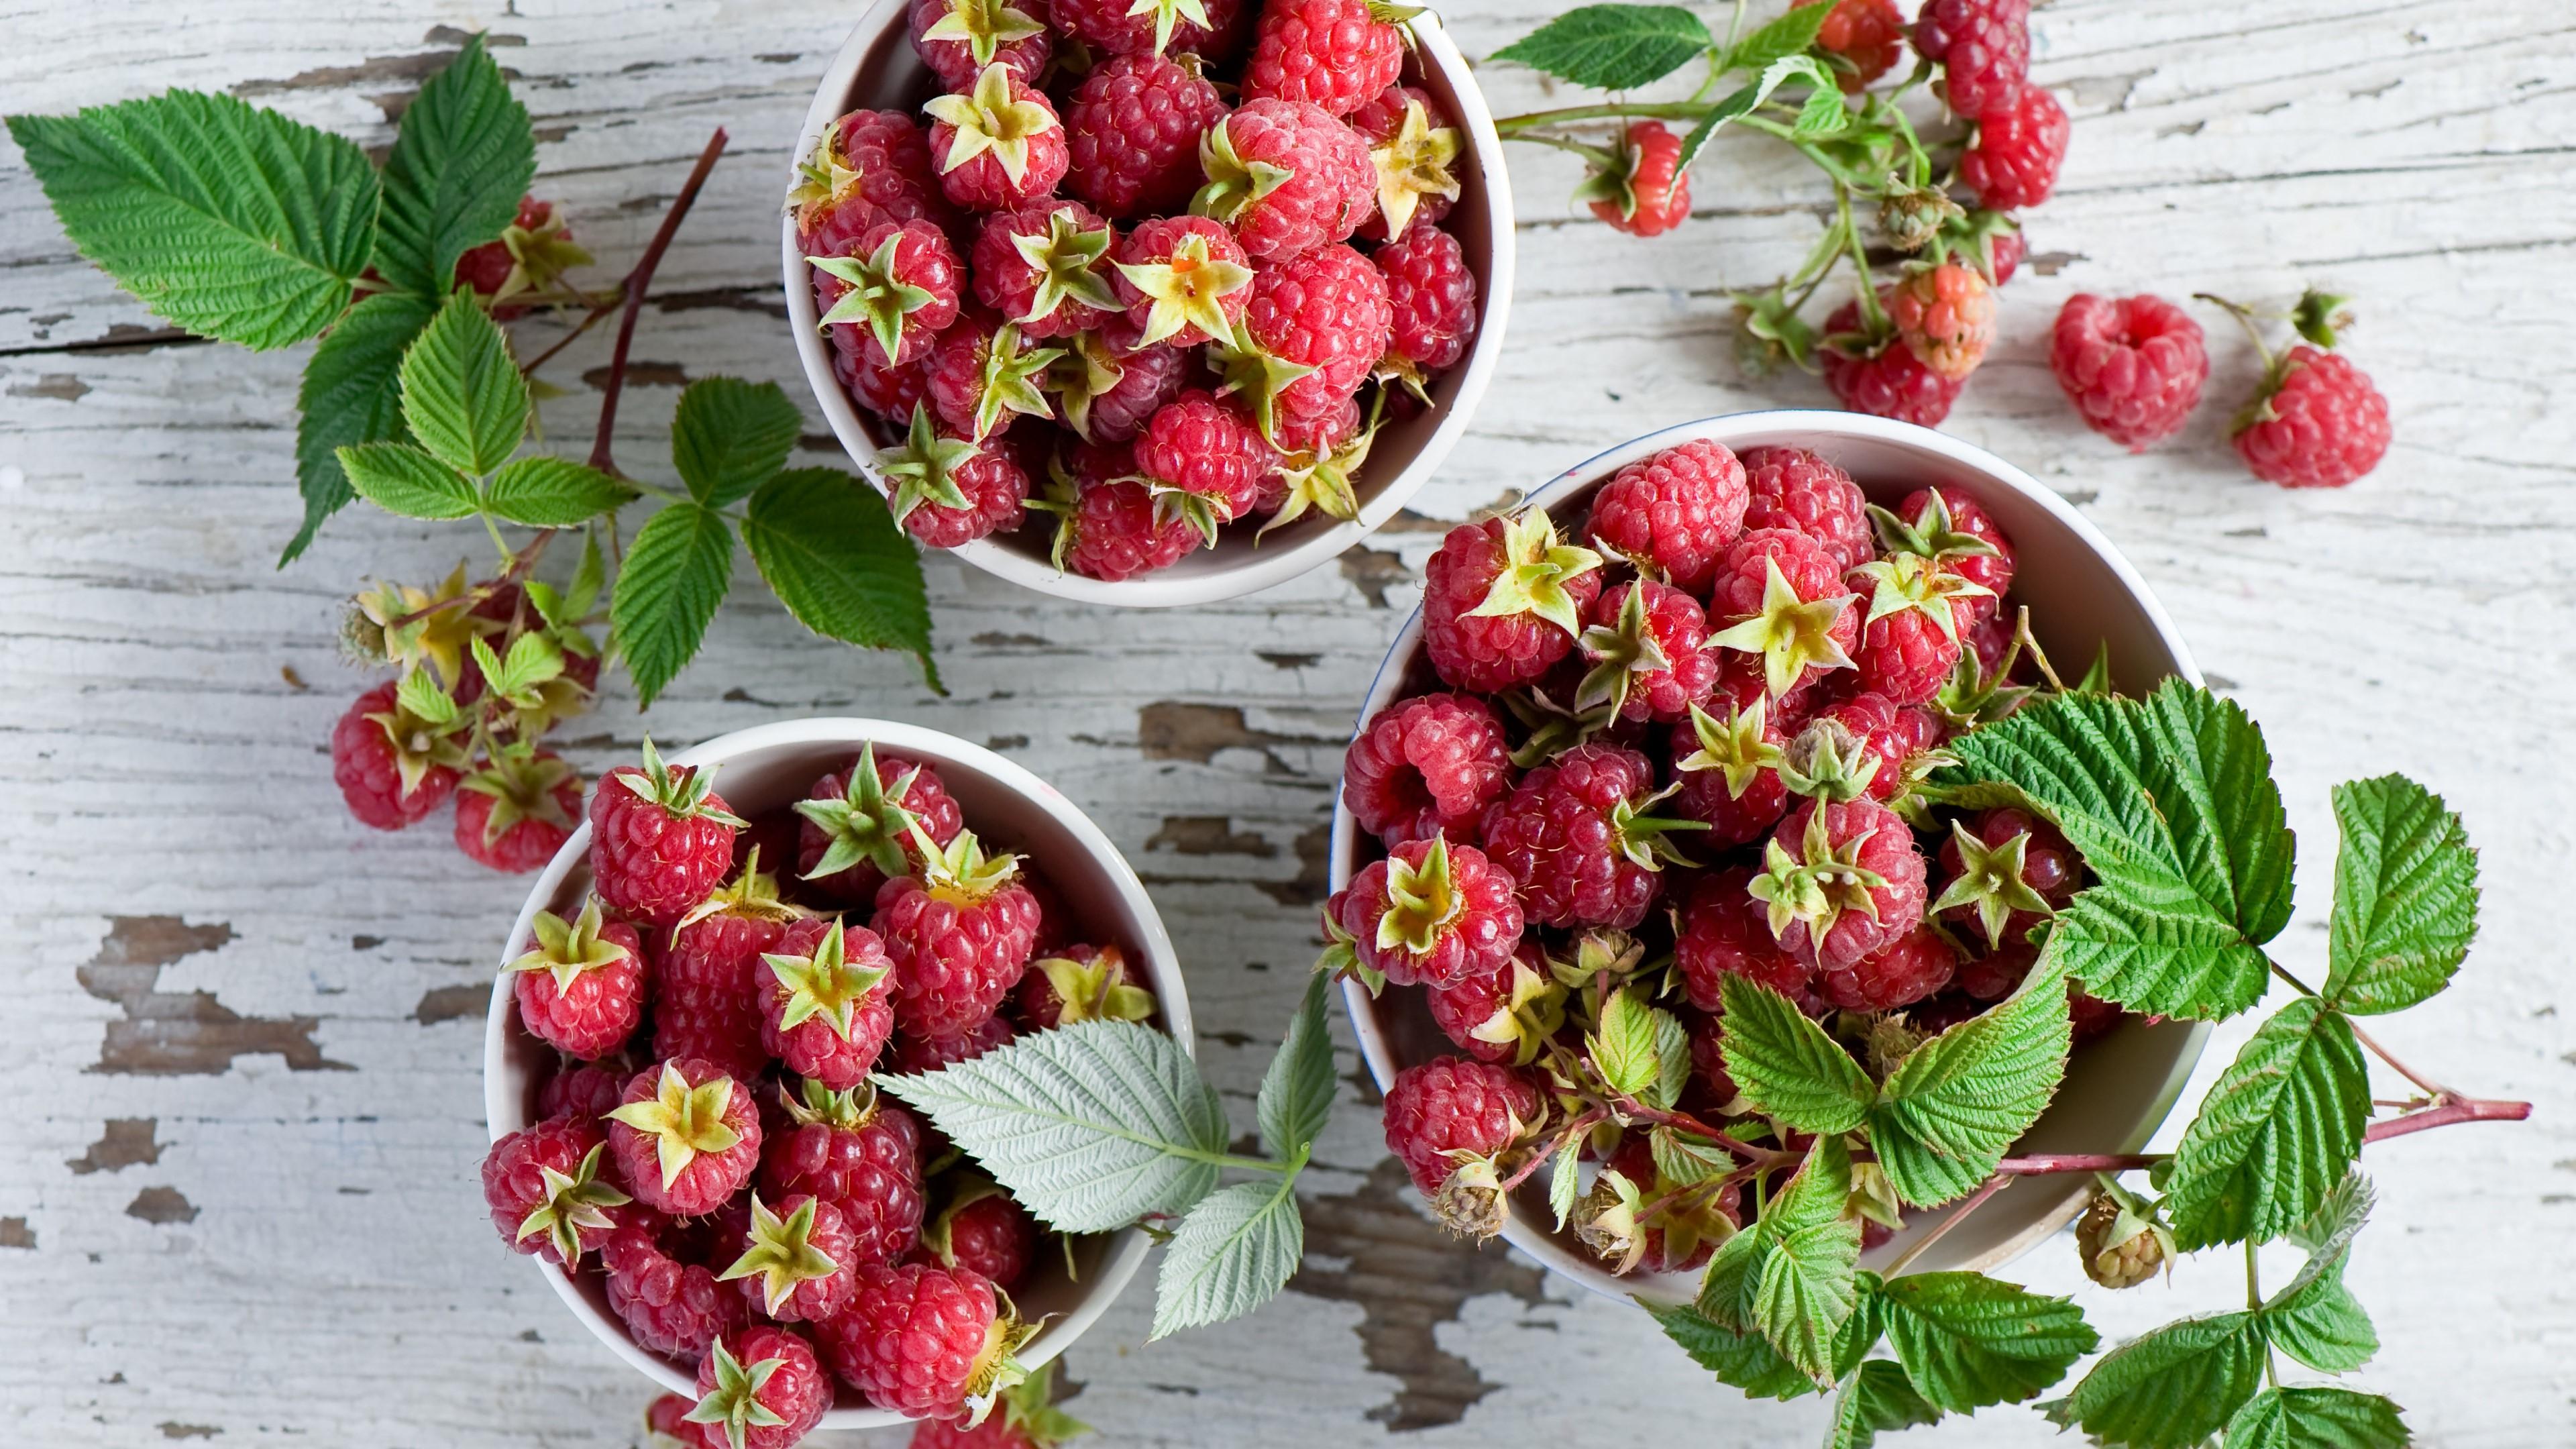 Wallpaper Table of raspberries